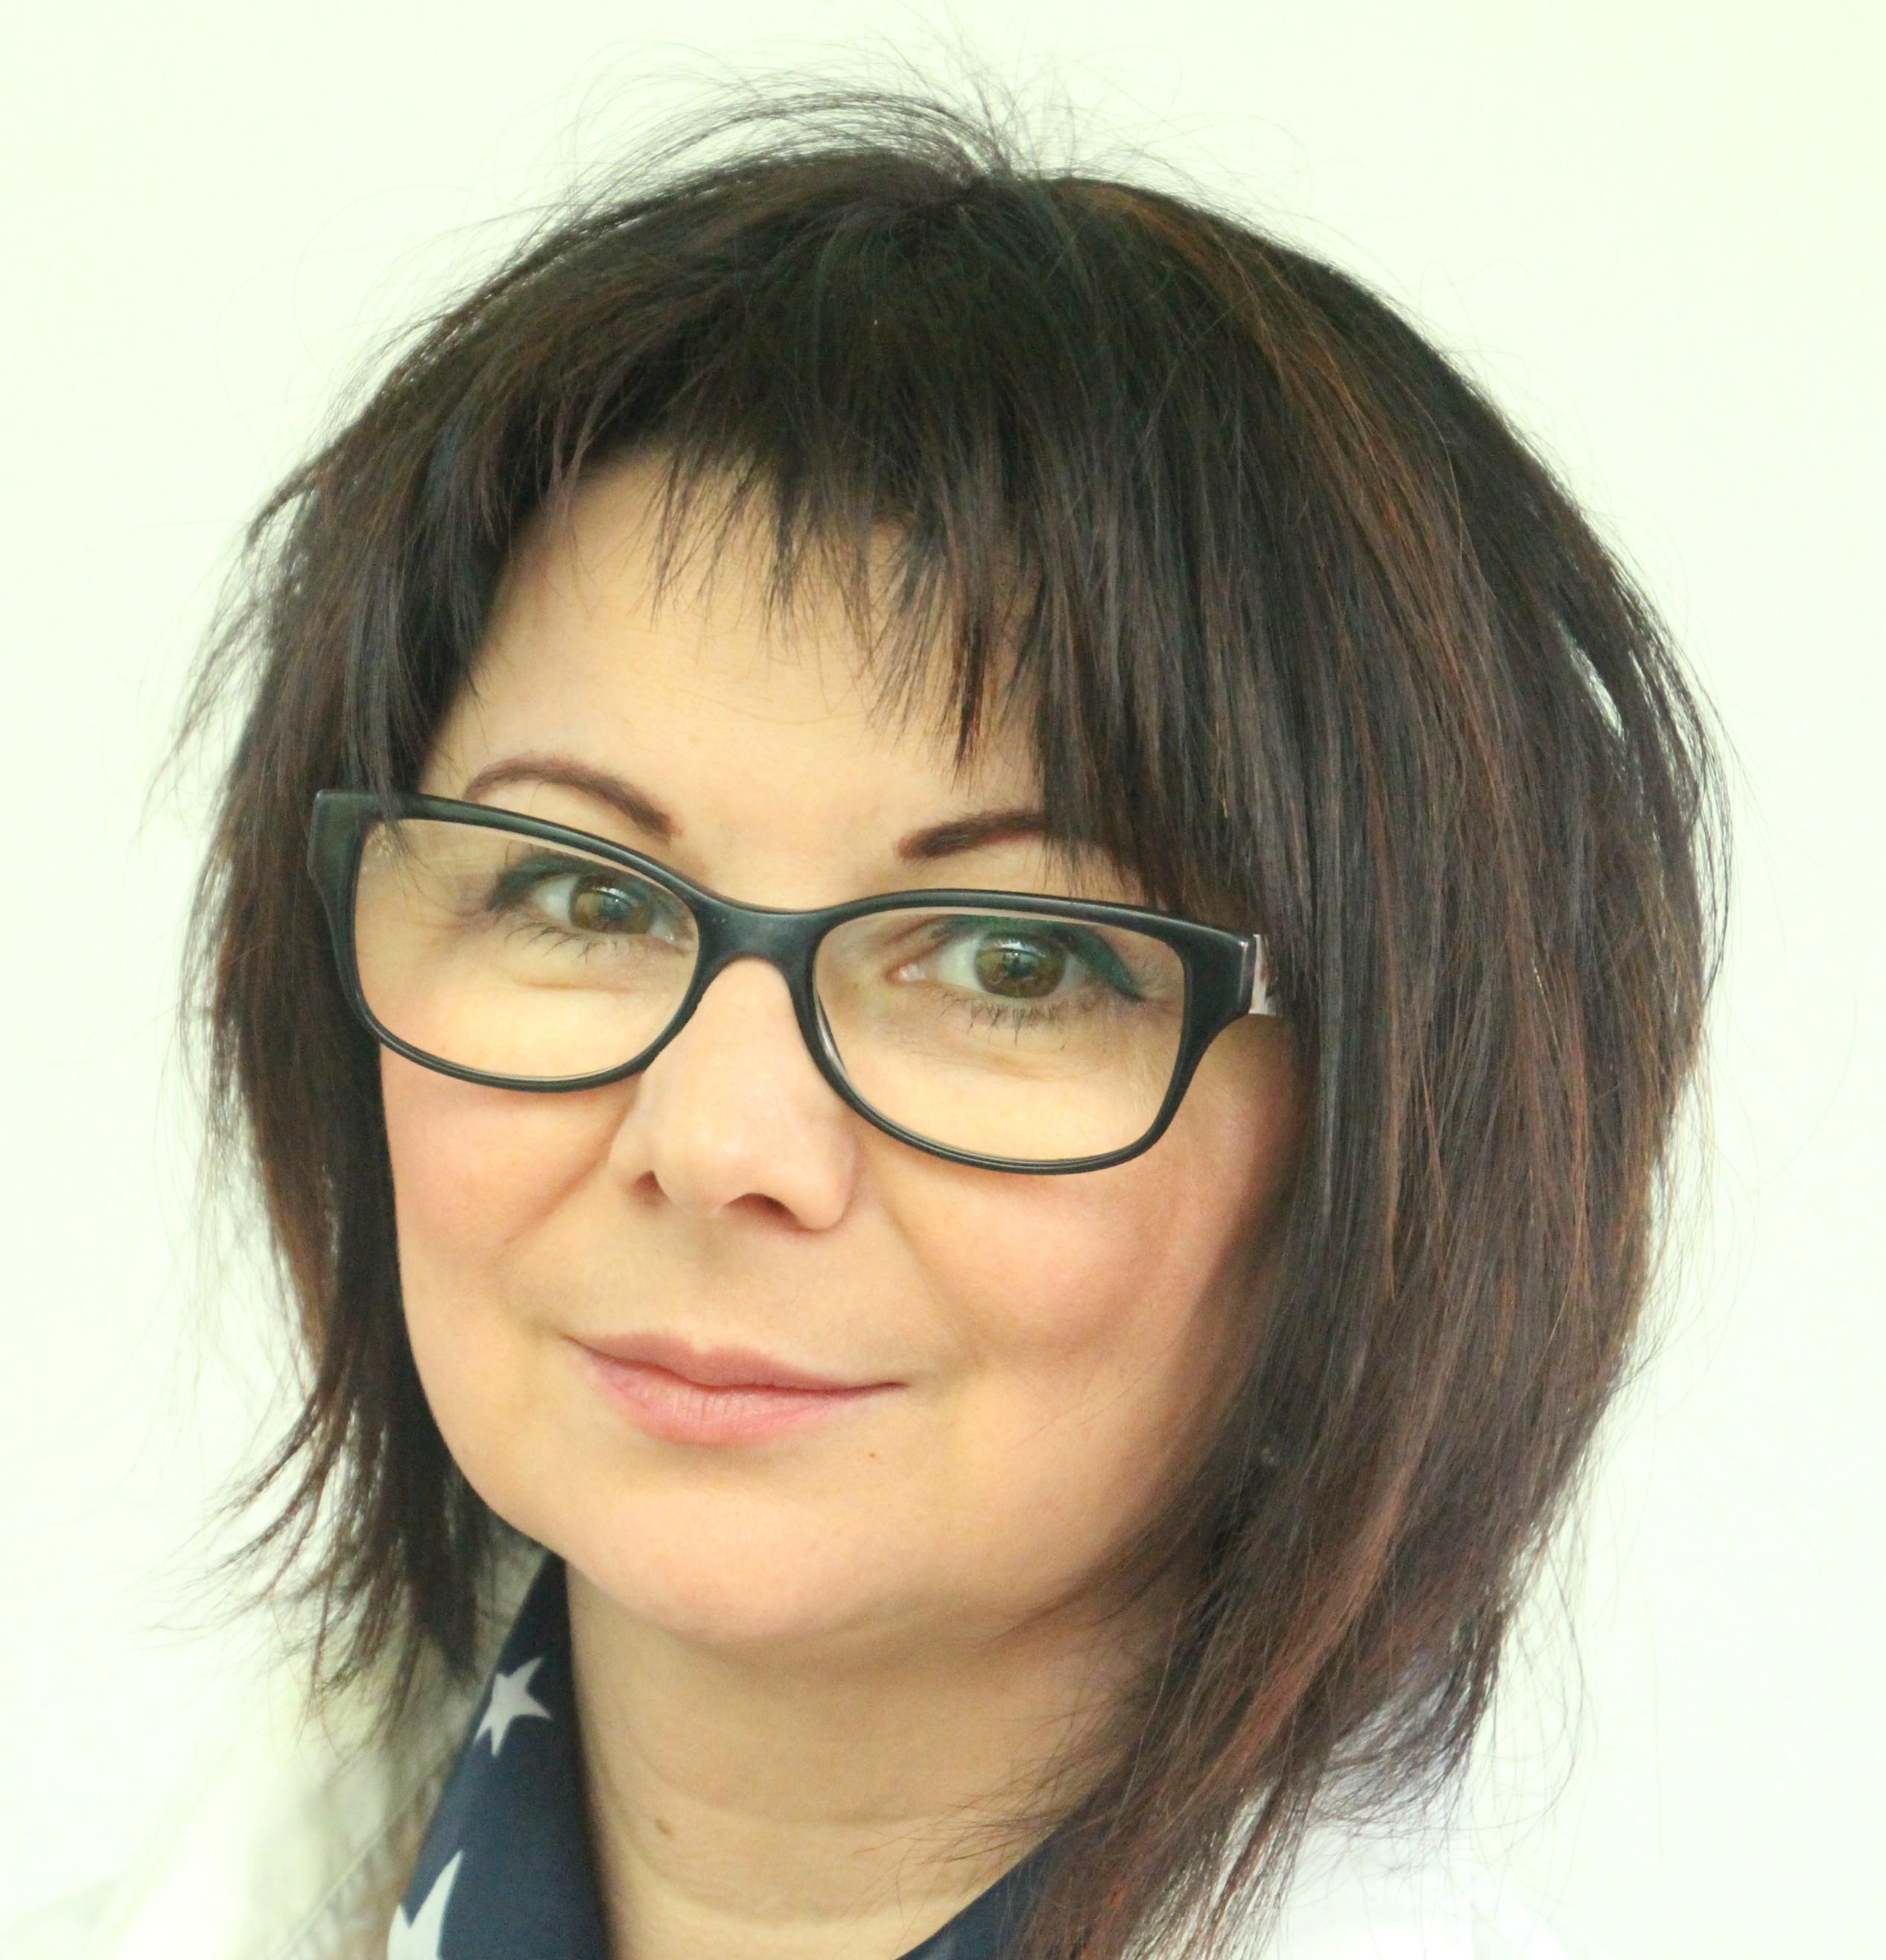 MUDr. Svetlana Hadvabová